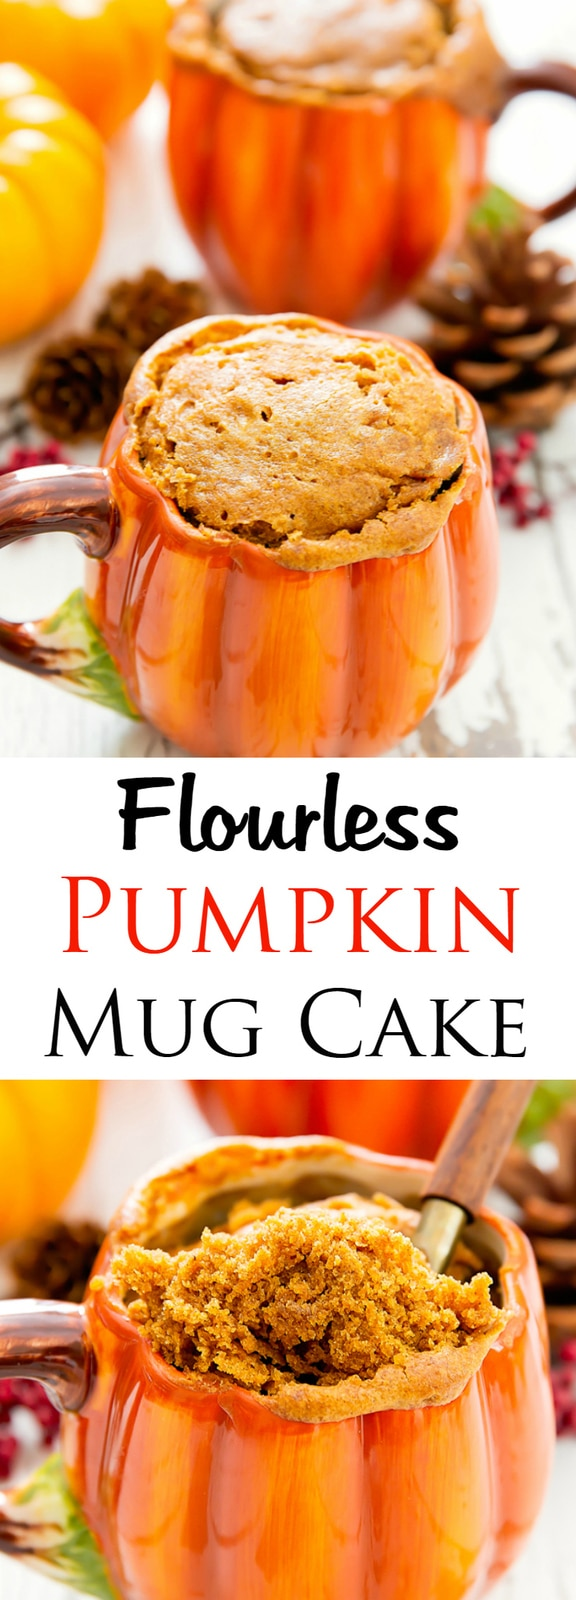 Flourless Pumpkin Mug Cake. Single serving gluten free cake ready in 10 minutes!